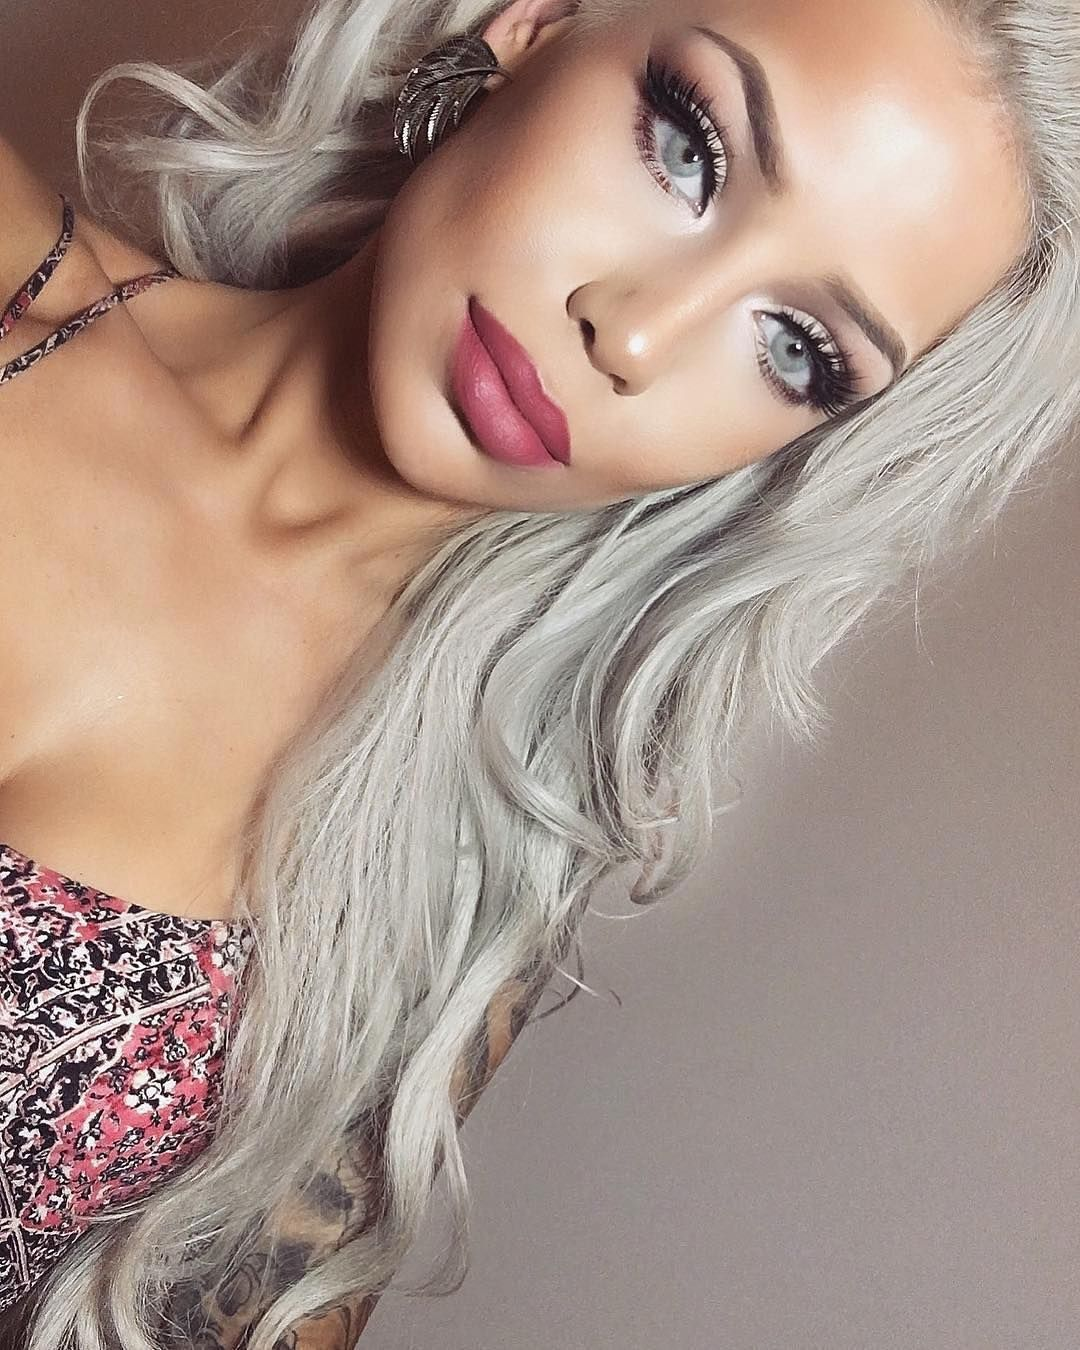 Hidrocor Quartzo (12 months wear) Hair beauty, Contact